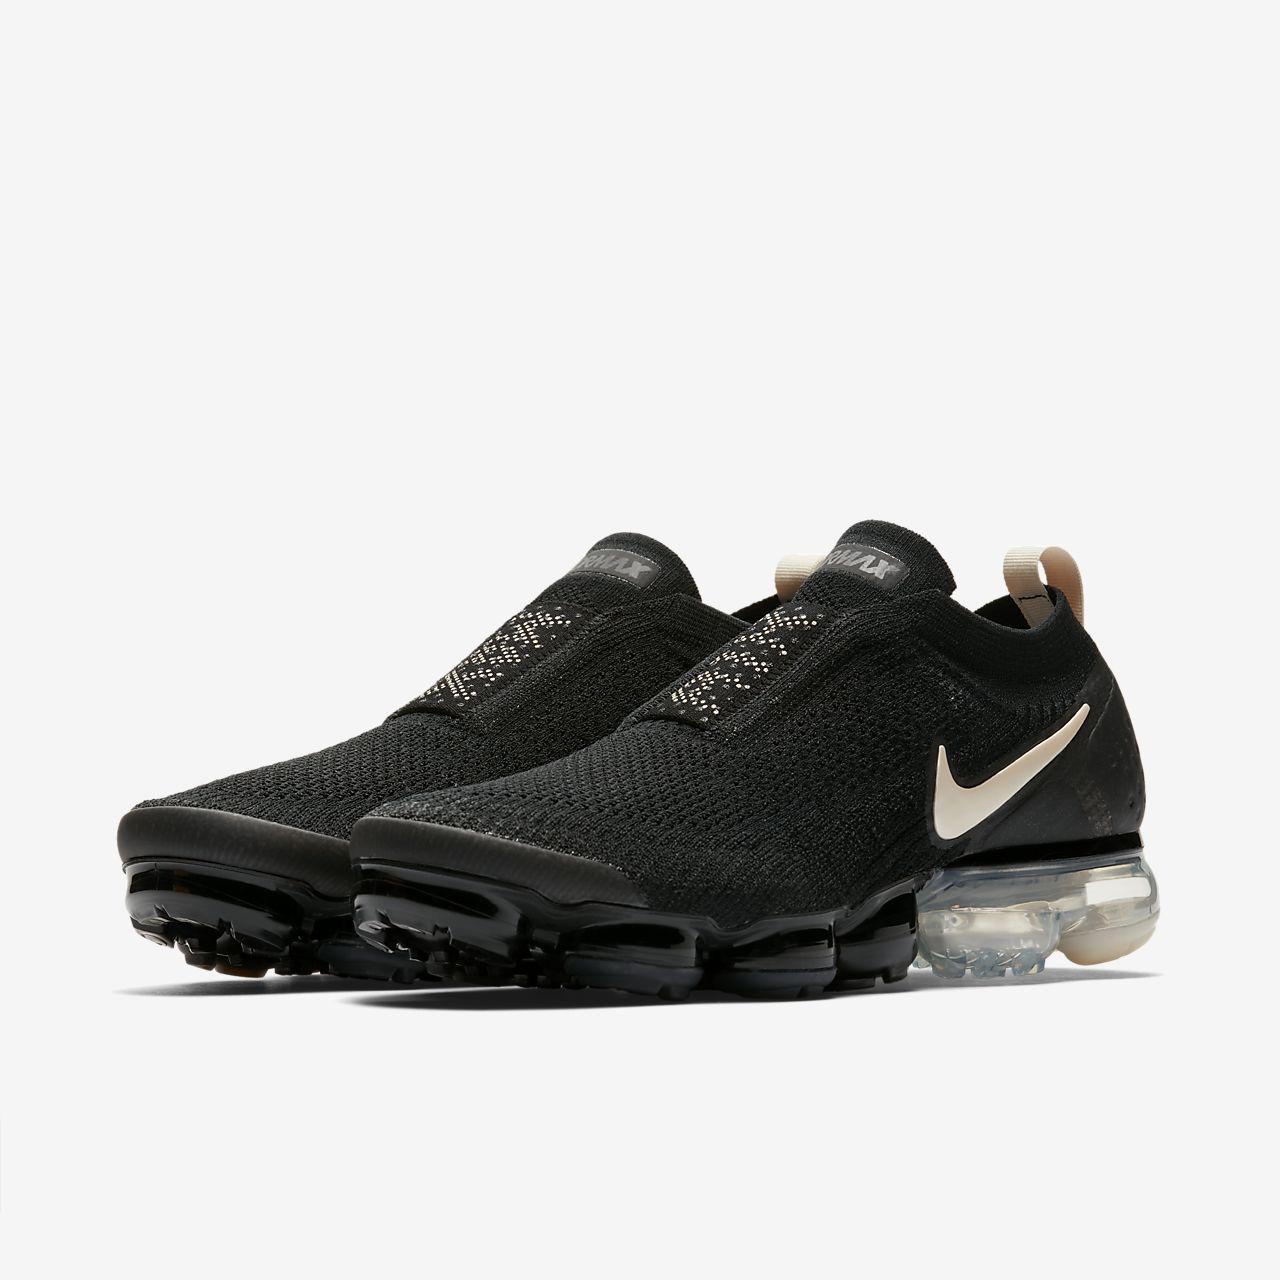 d2a901e2d63 Nike Air VaporMax Flyknit Moc 2 Shoe. Nike.com CA